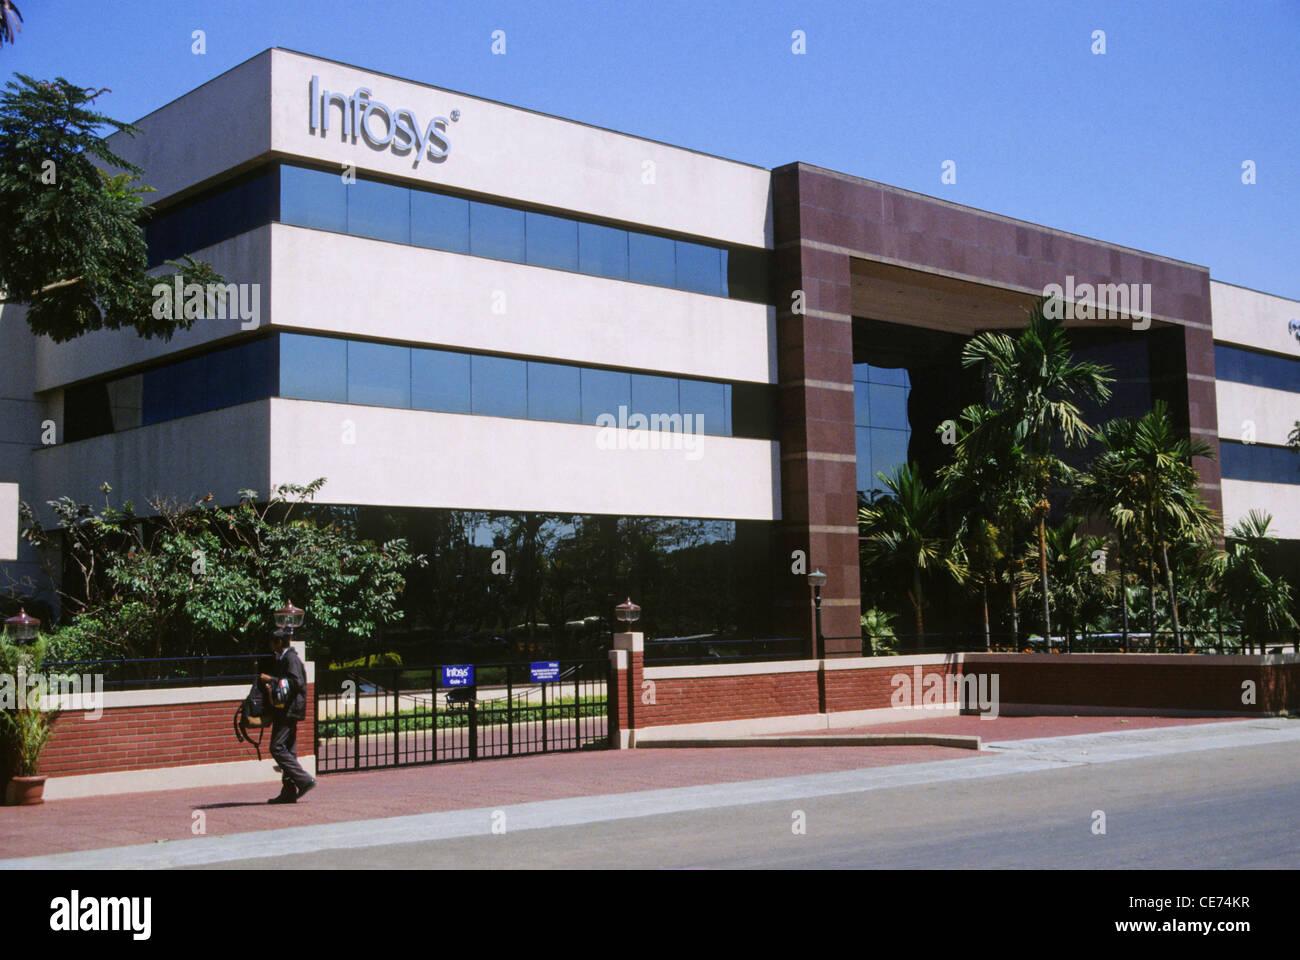 Infosys edificio Electronic City bangalore karnataka india Immagini Stock